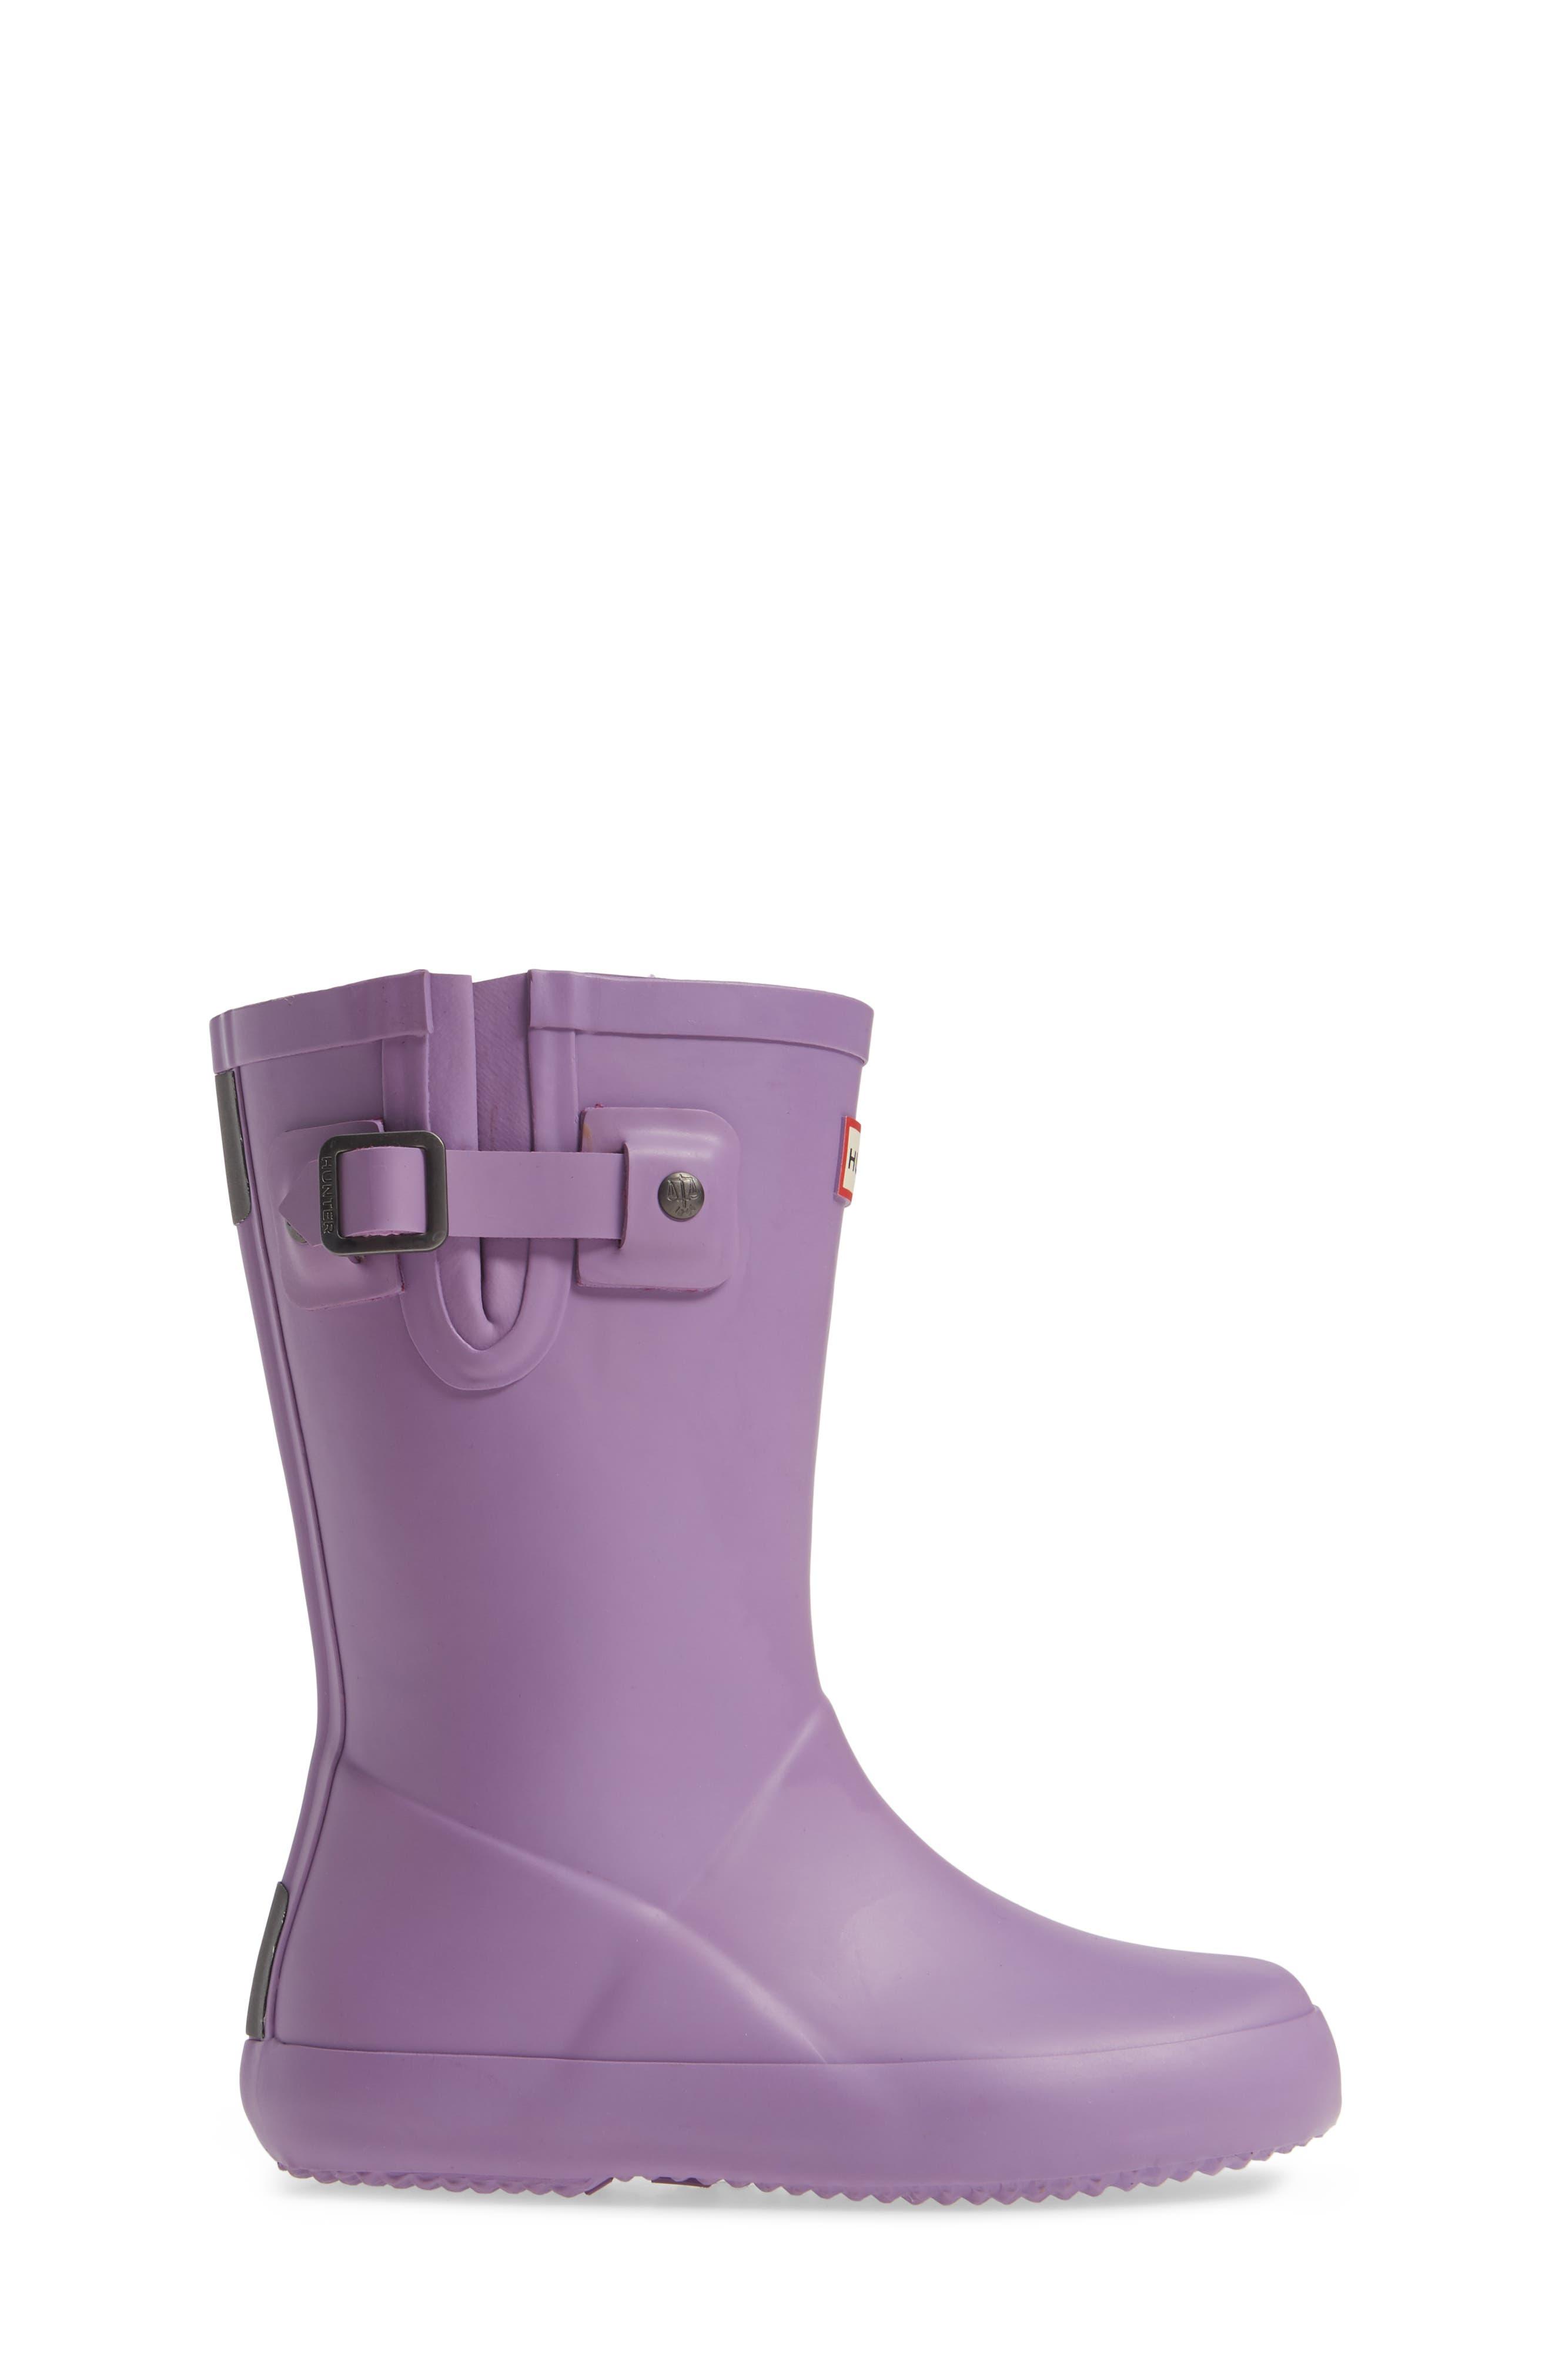 Buckle Strap Rain Boot,                             Alternate thumbnail 3, color,                             BRIGHT LAVENDER